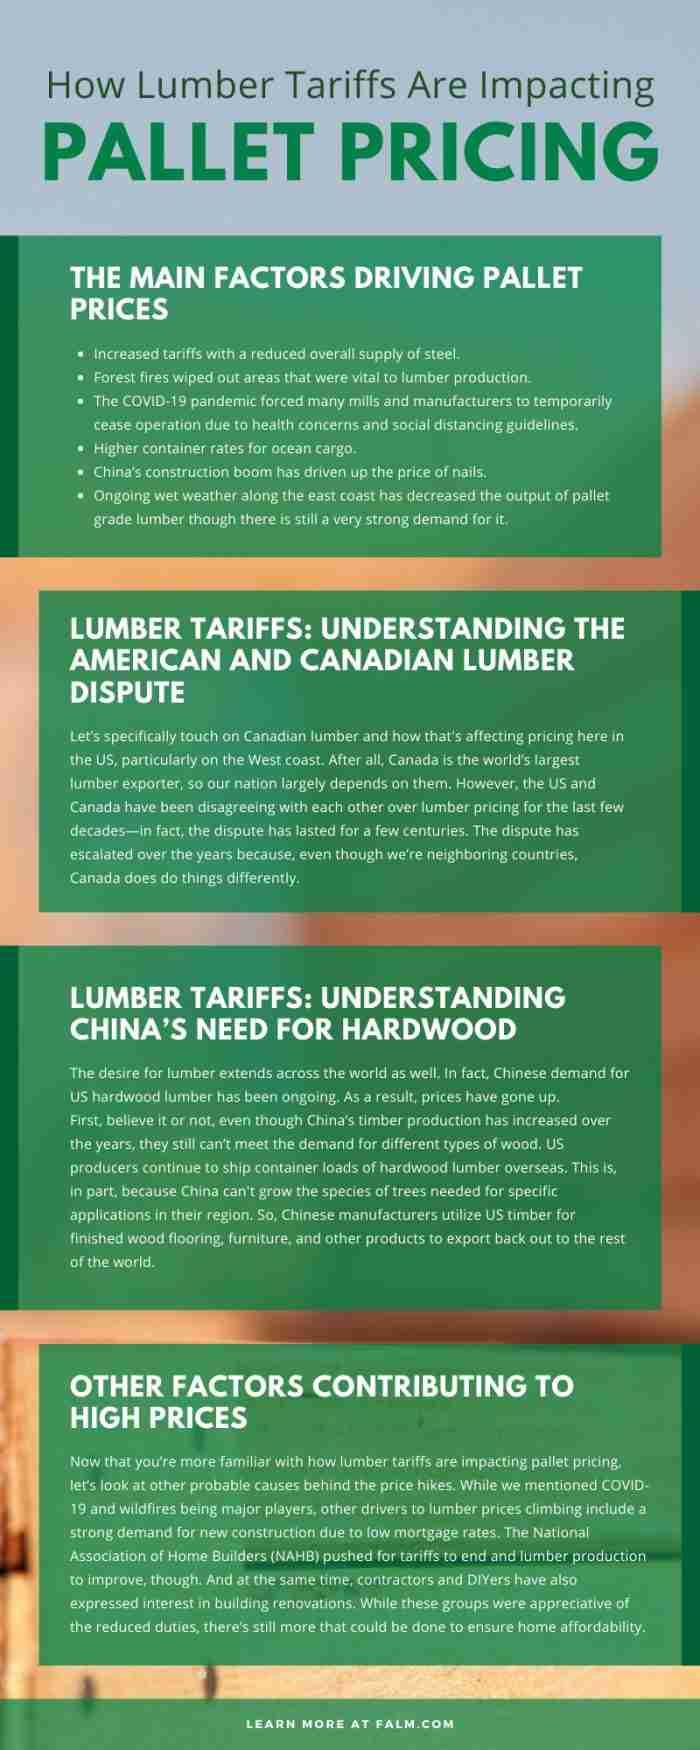 firstalliancelogisticsmanagementllc 88795 lumber tariffs pallet infographic3 e1619727117507